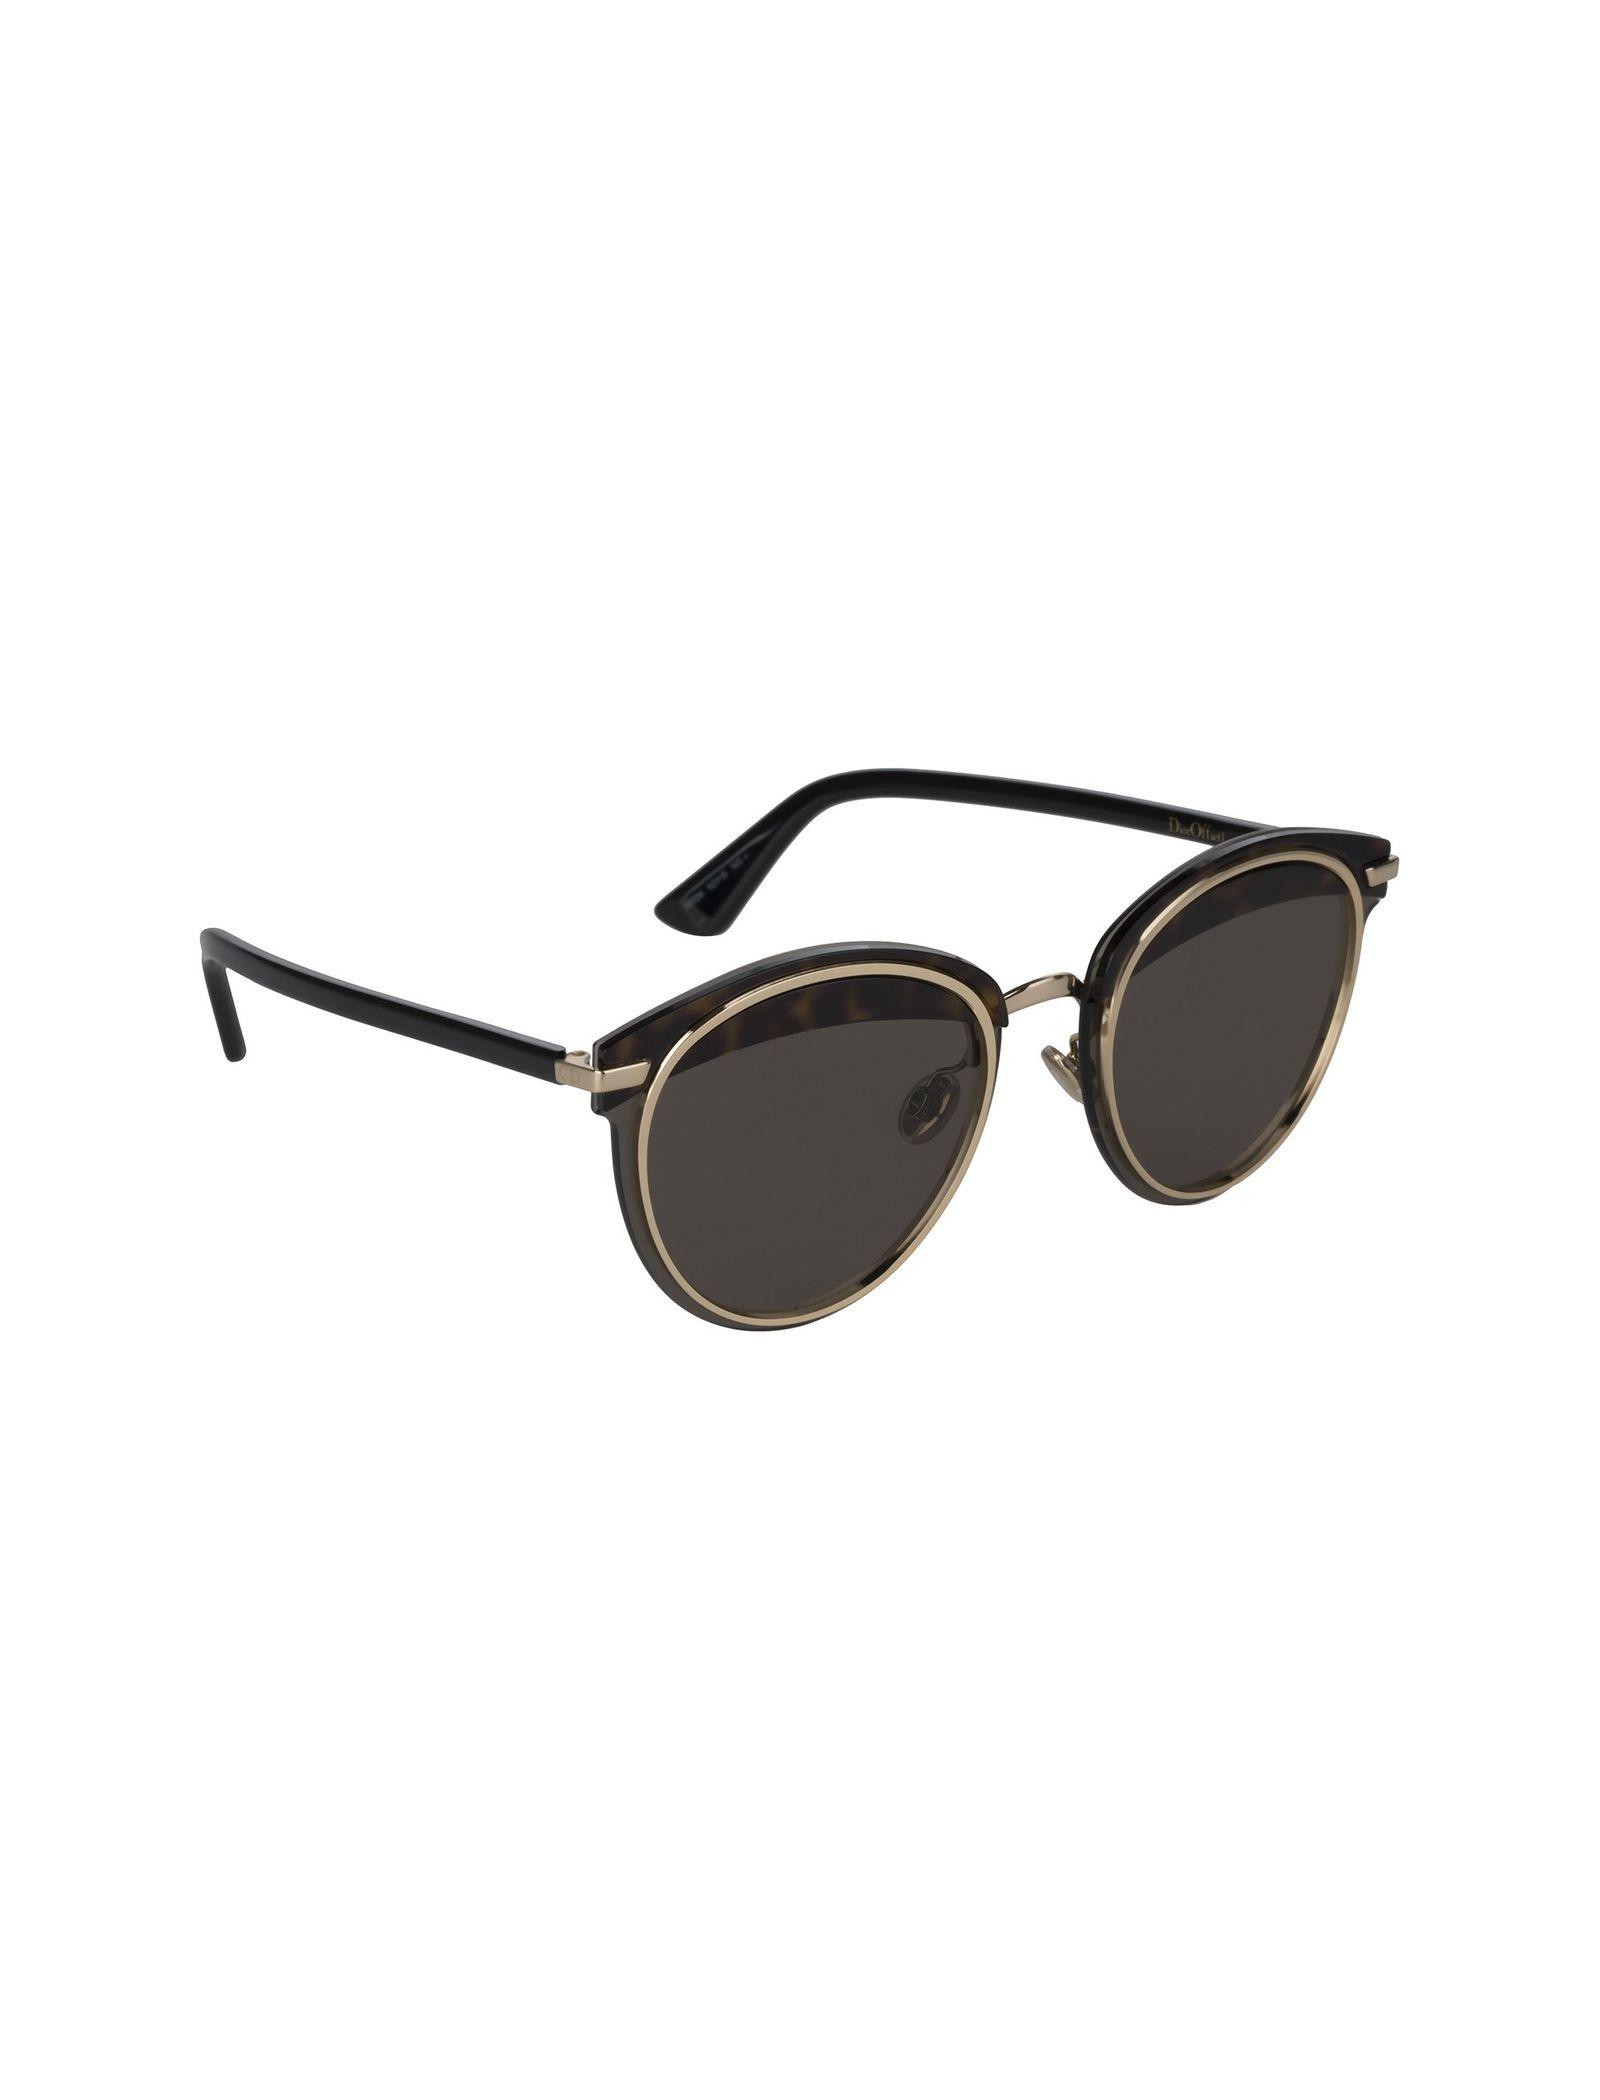 عینک آفتابی پنتوس زنانه - دیور - مشکي لاک پشتي - 2